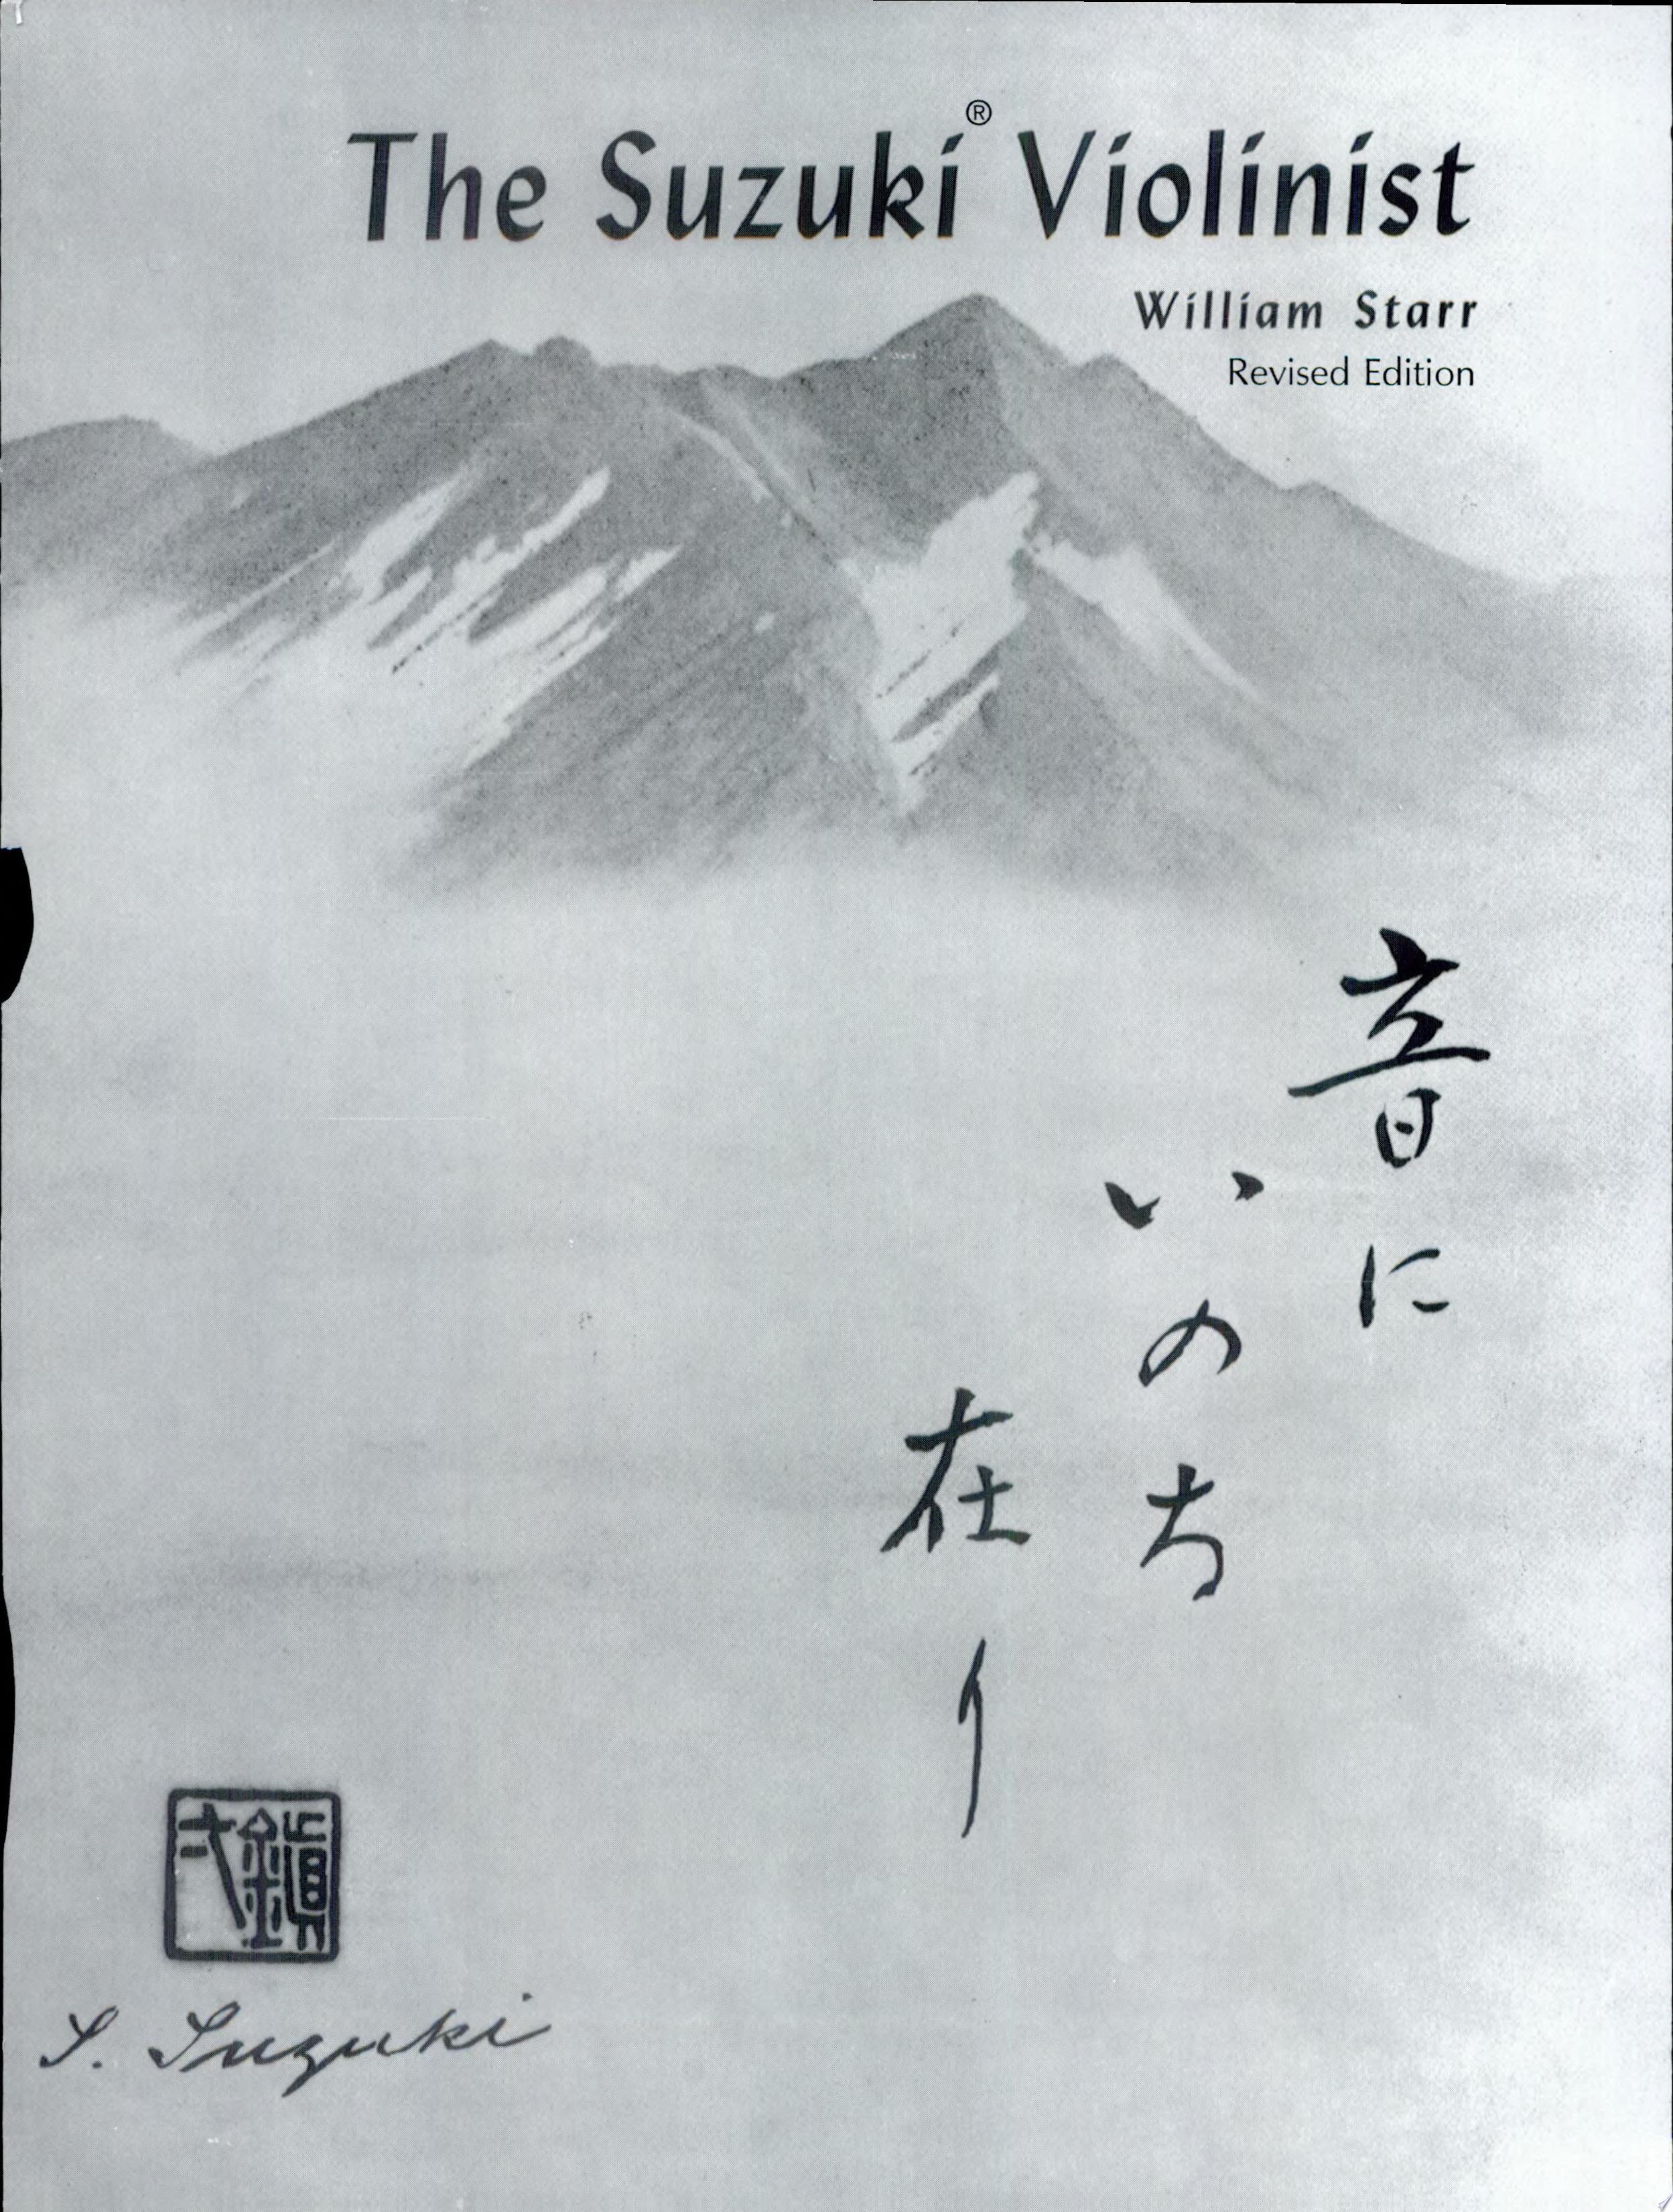 The Suzuki Violinist  Revised